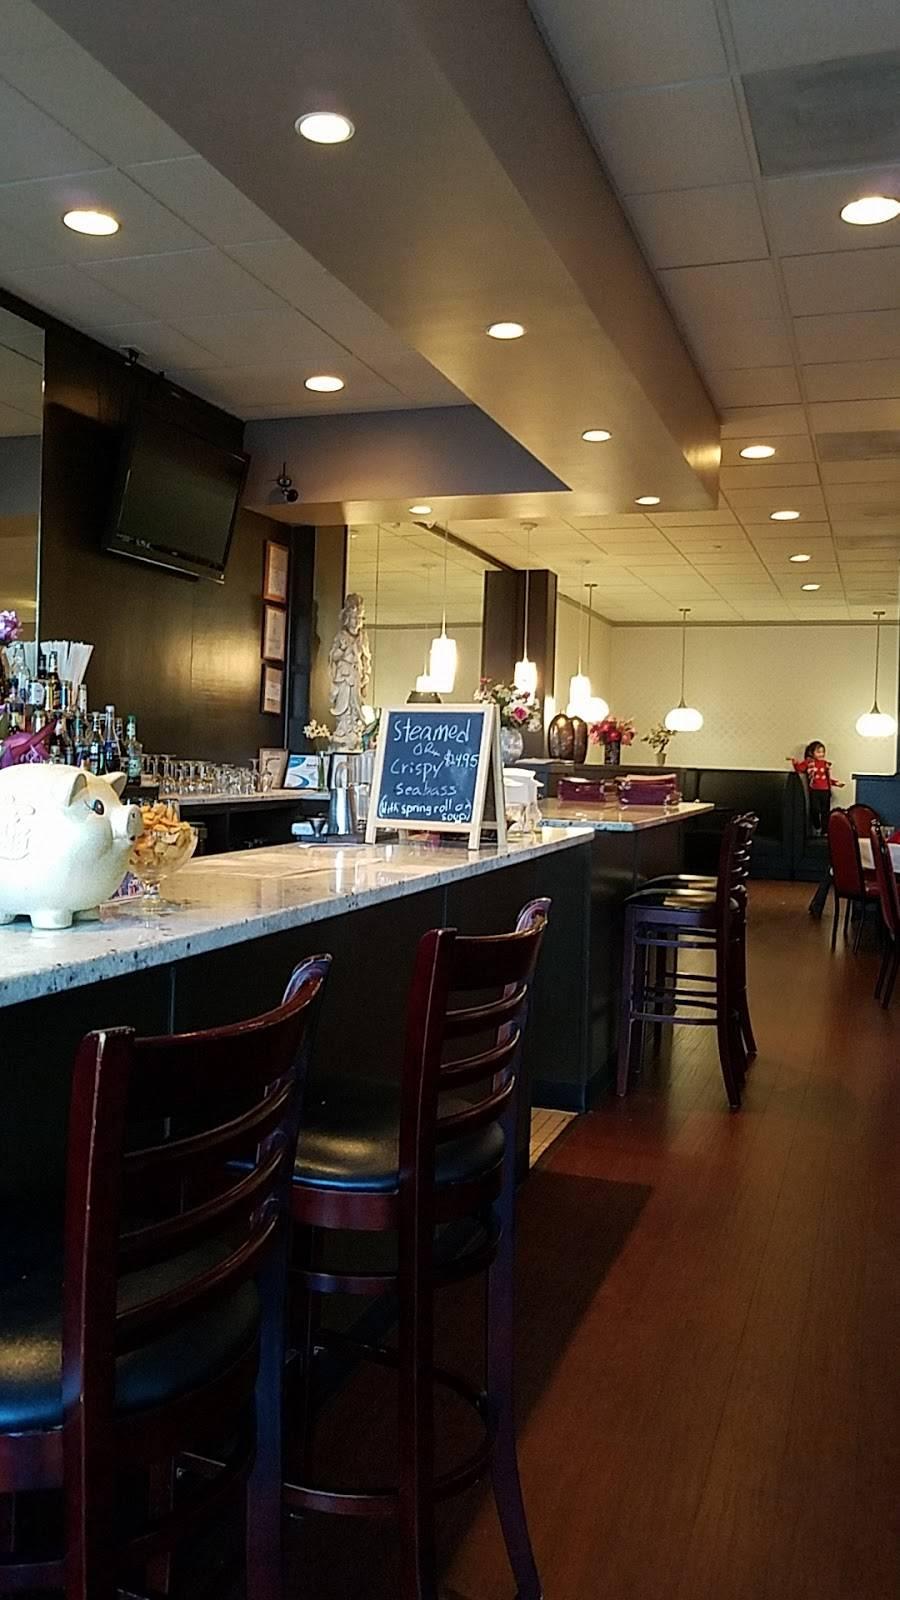 House Of Chou | restaurant | 12508 Dillingham Square, Woodbridge, VA 22192, USA | 7035900596 OR +1 703-590-0596